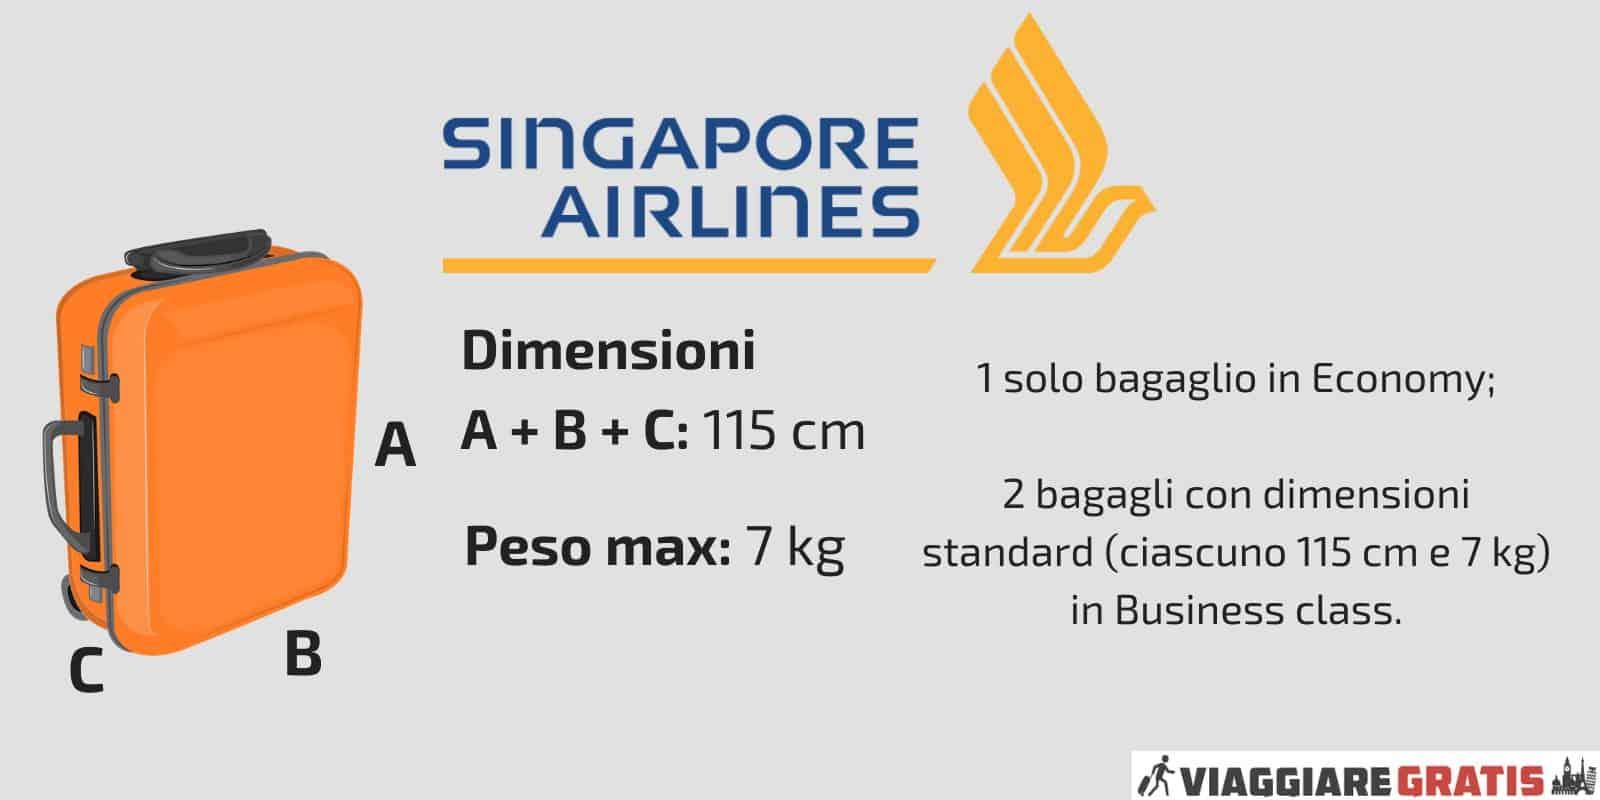 Bagaglio a Mano Singapore Airlines